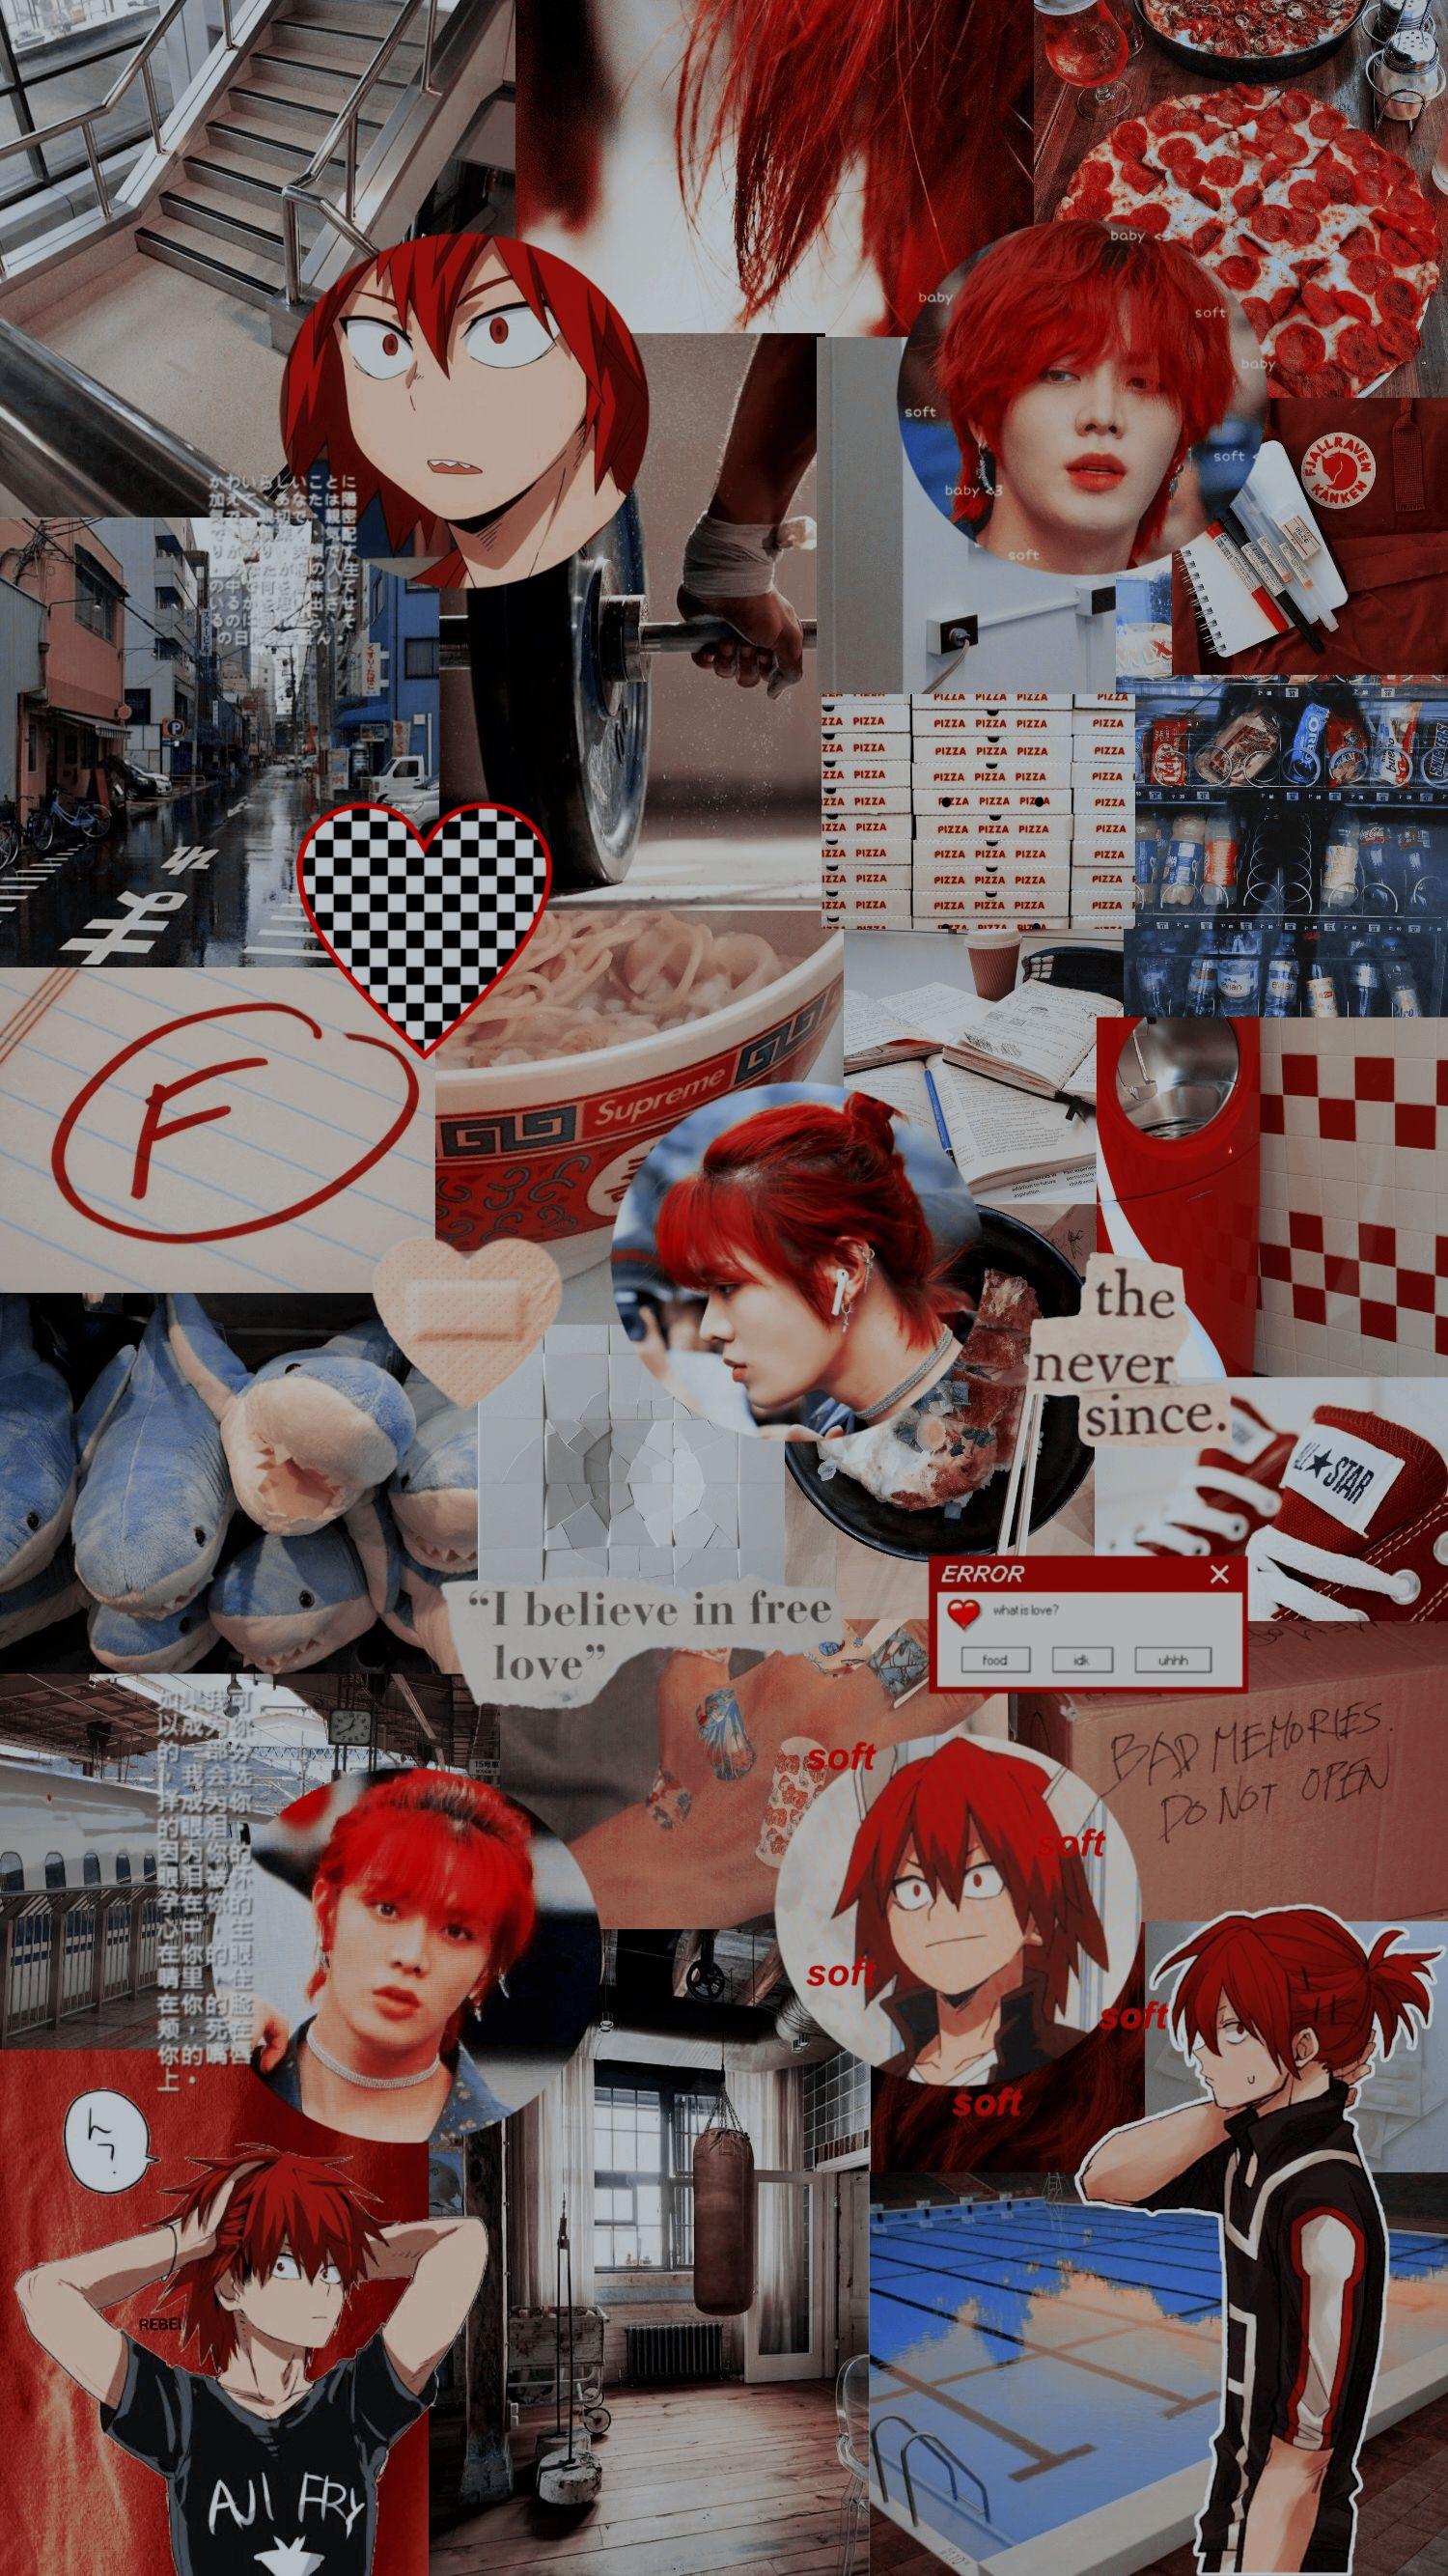 Kpop Anime Wallpaper Nct Nct127 Yuta Nakamotoyuta Kirishima Bnha Bokunohero In 2021 Anime Anime Wallpaper Nct